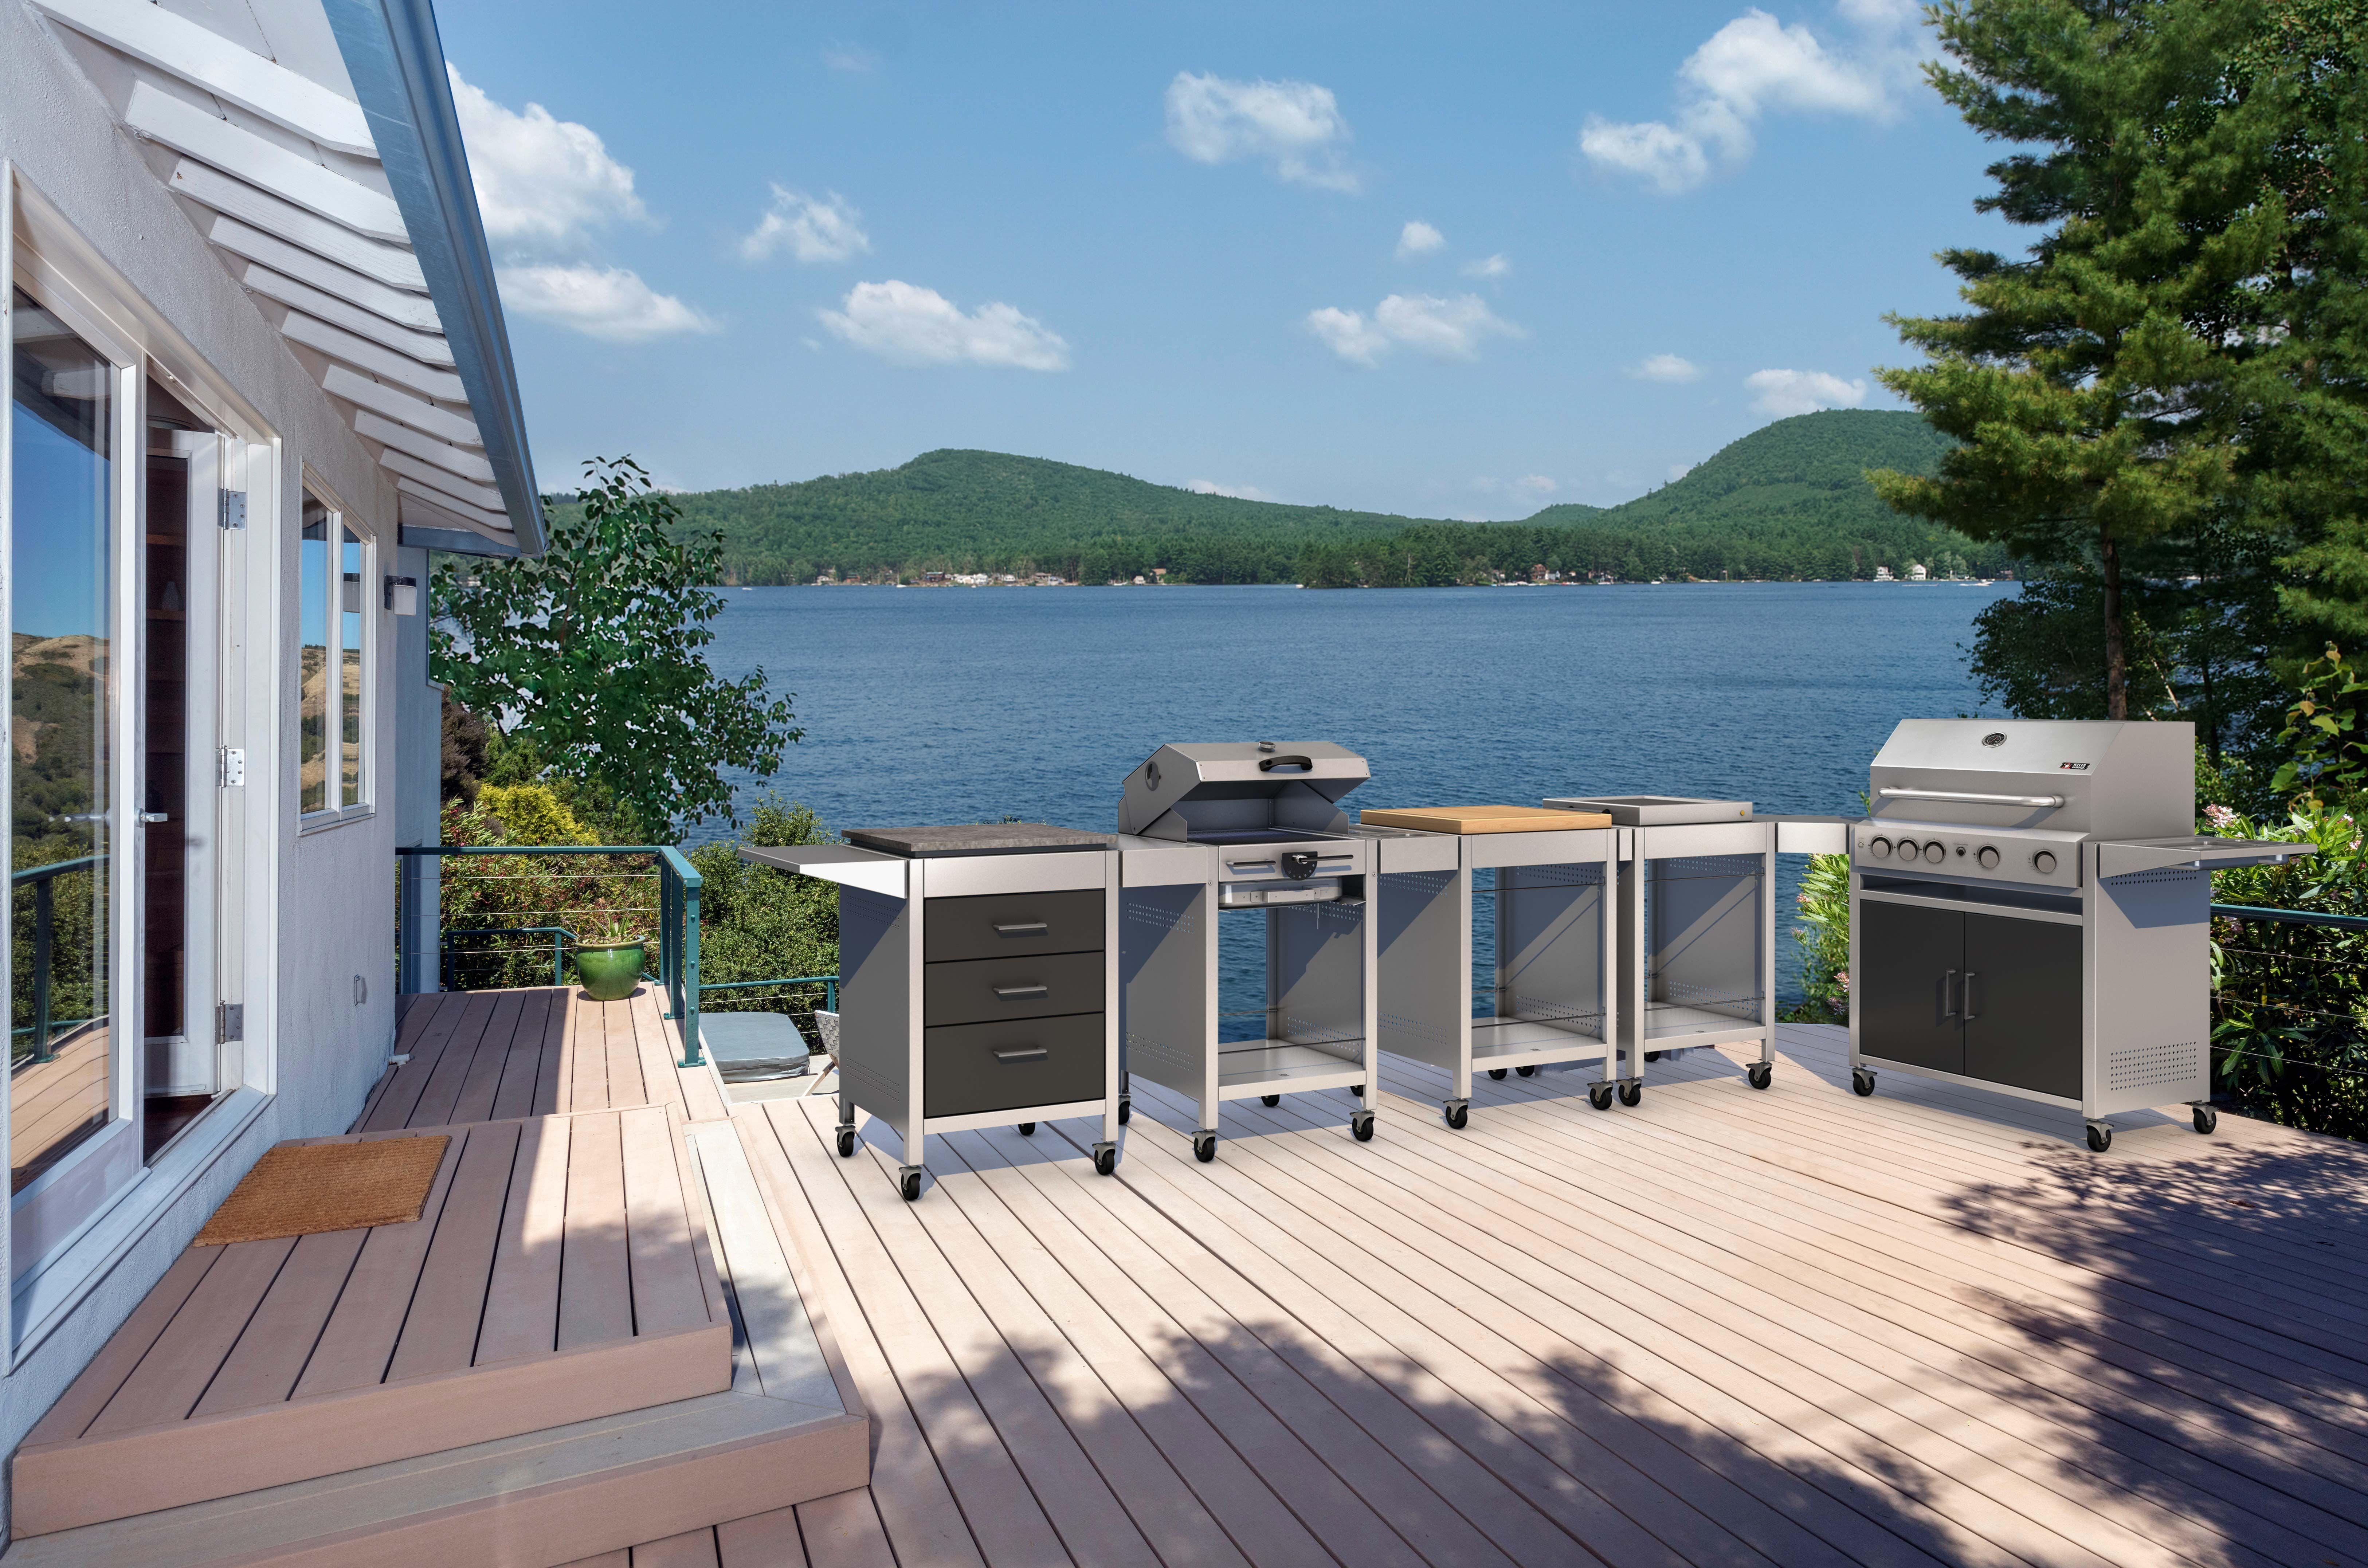 Outdoorküche Garten Edelstahl Kosten : Röshults mit outdoorküche aus eschenholz und edelstahl schÖner